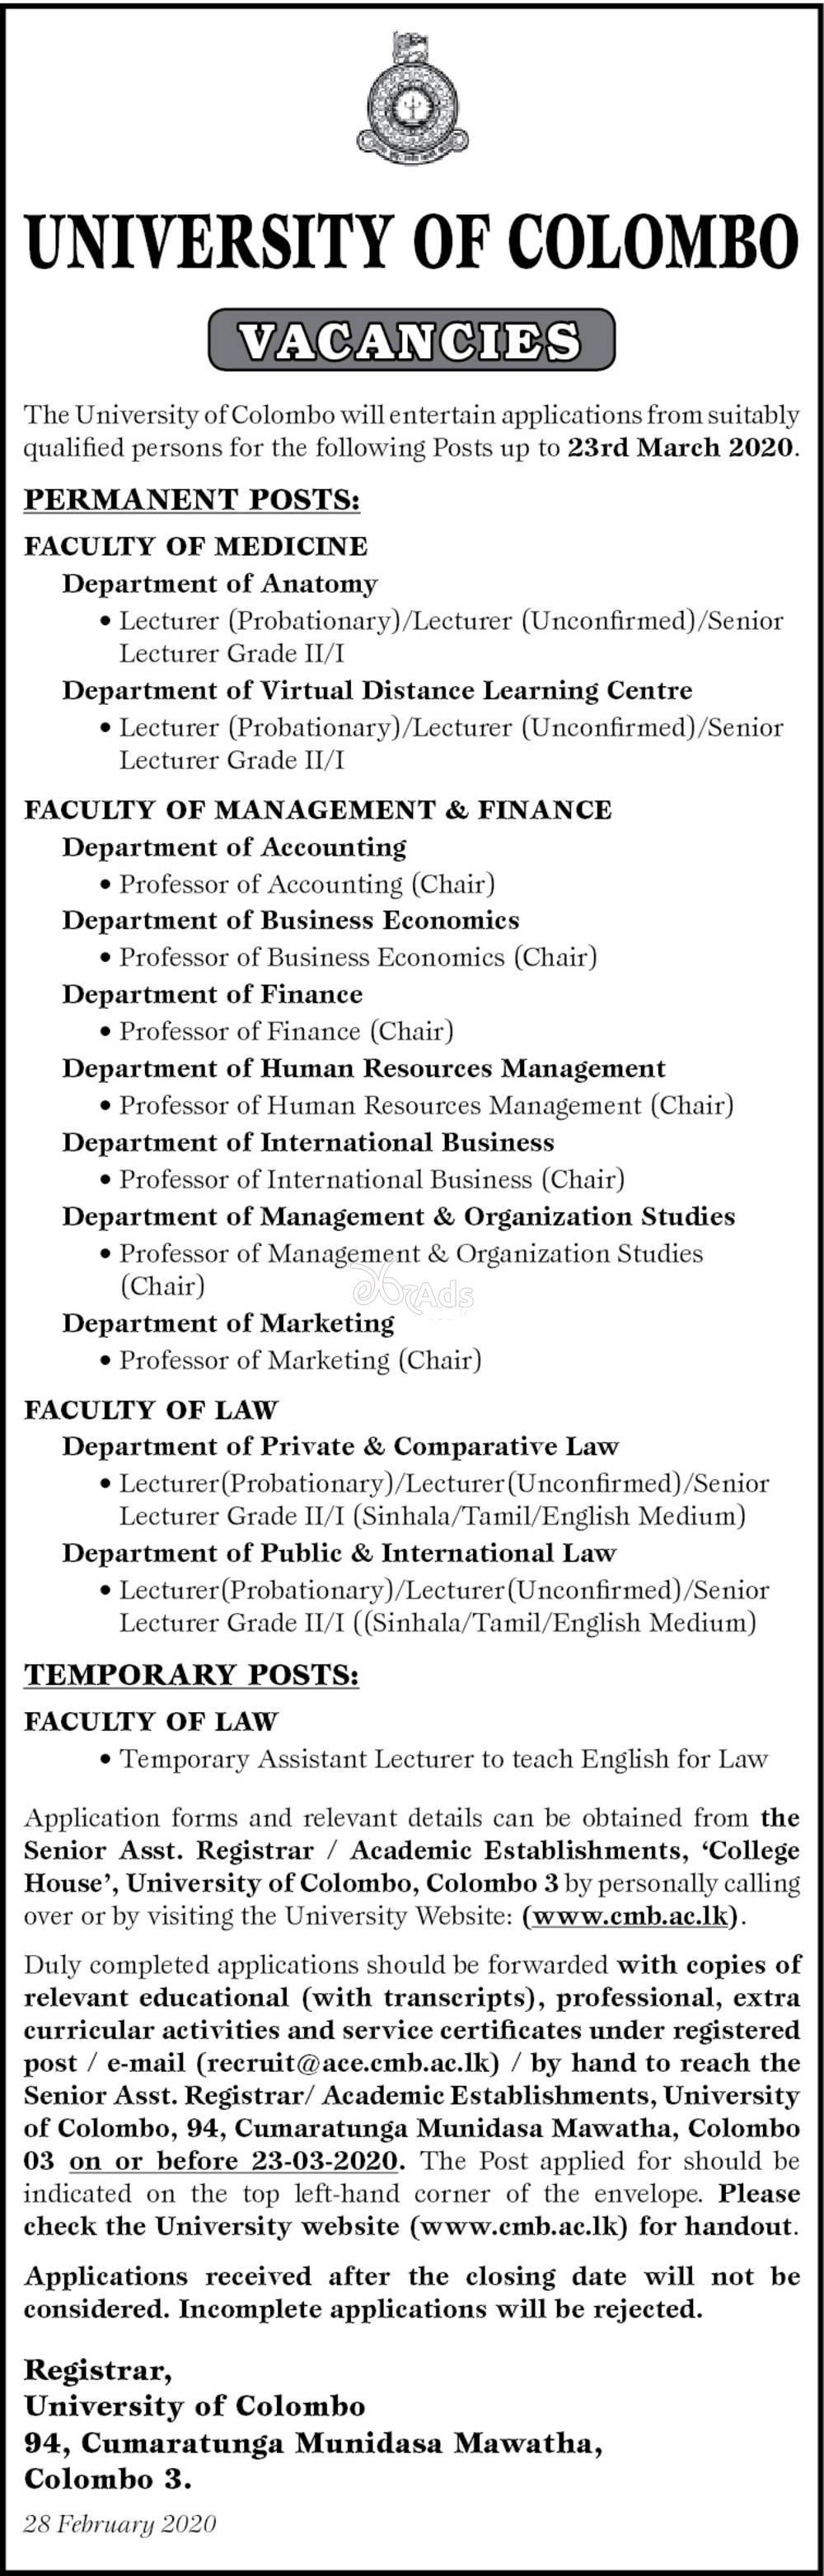 Professor, Senior Lecturer, Lecturer - University of Colombo